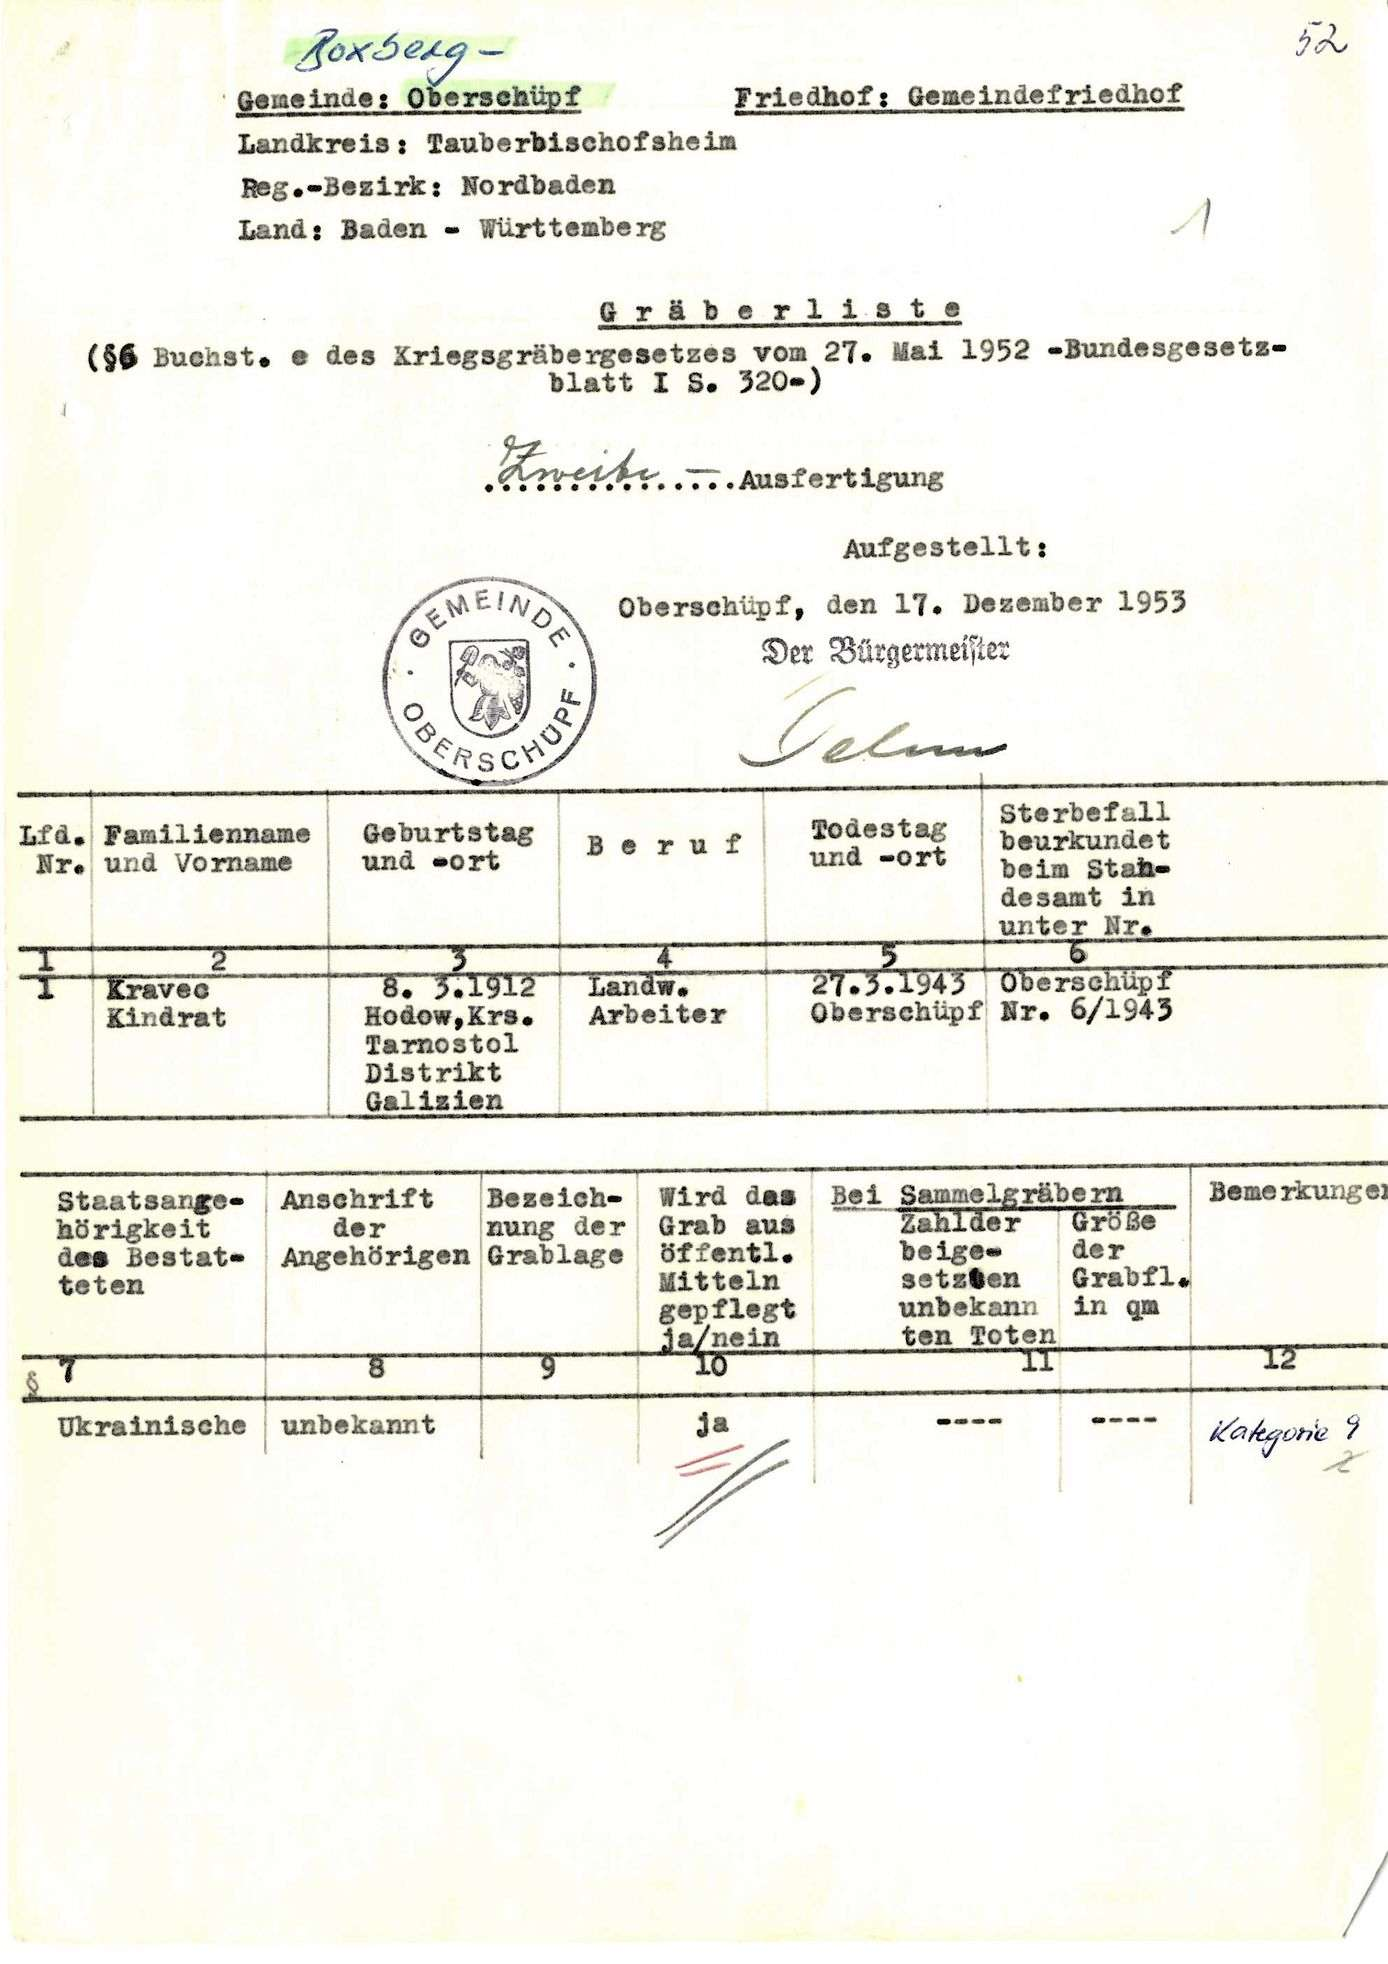 Oberschüpf, Bild 1